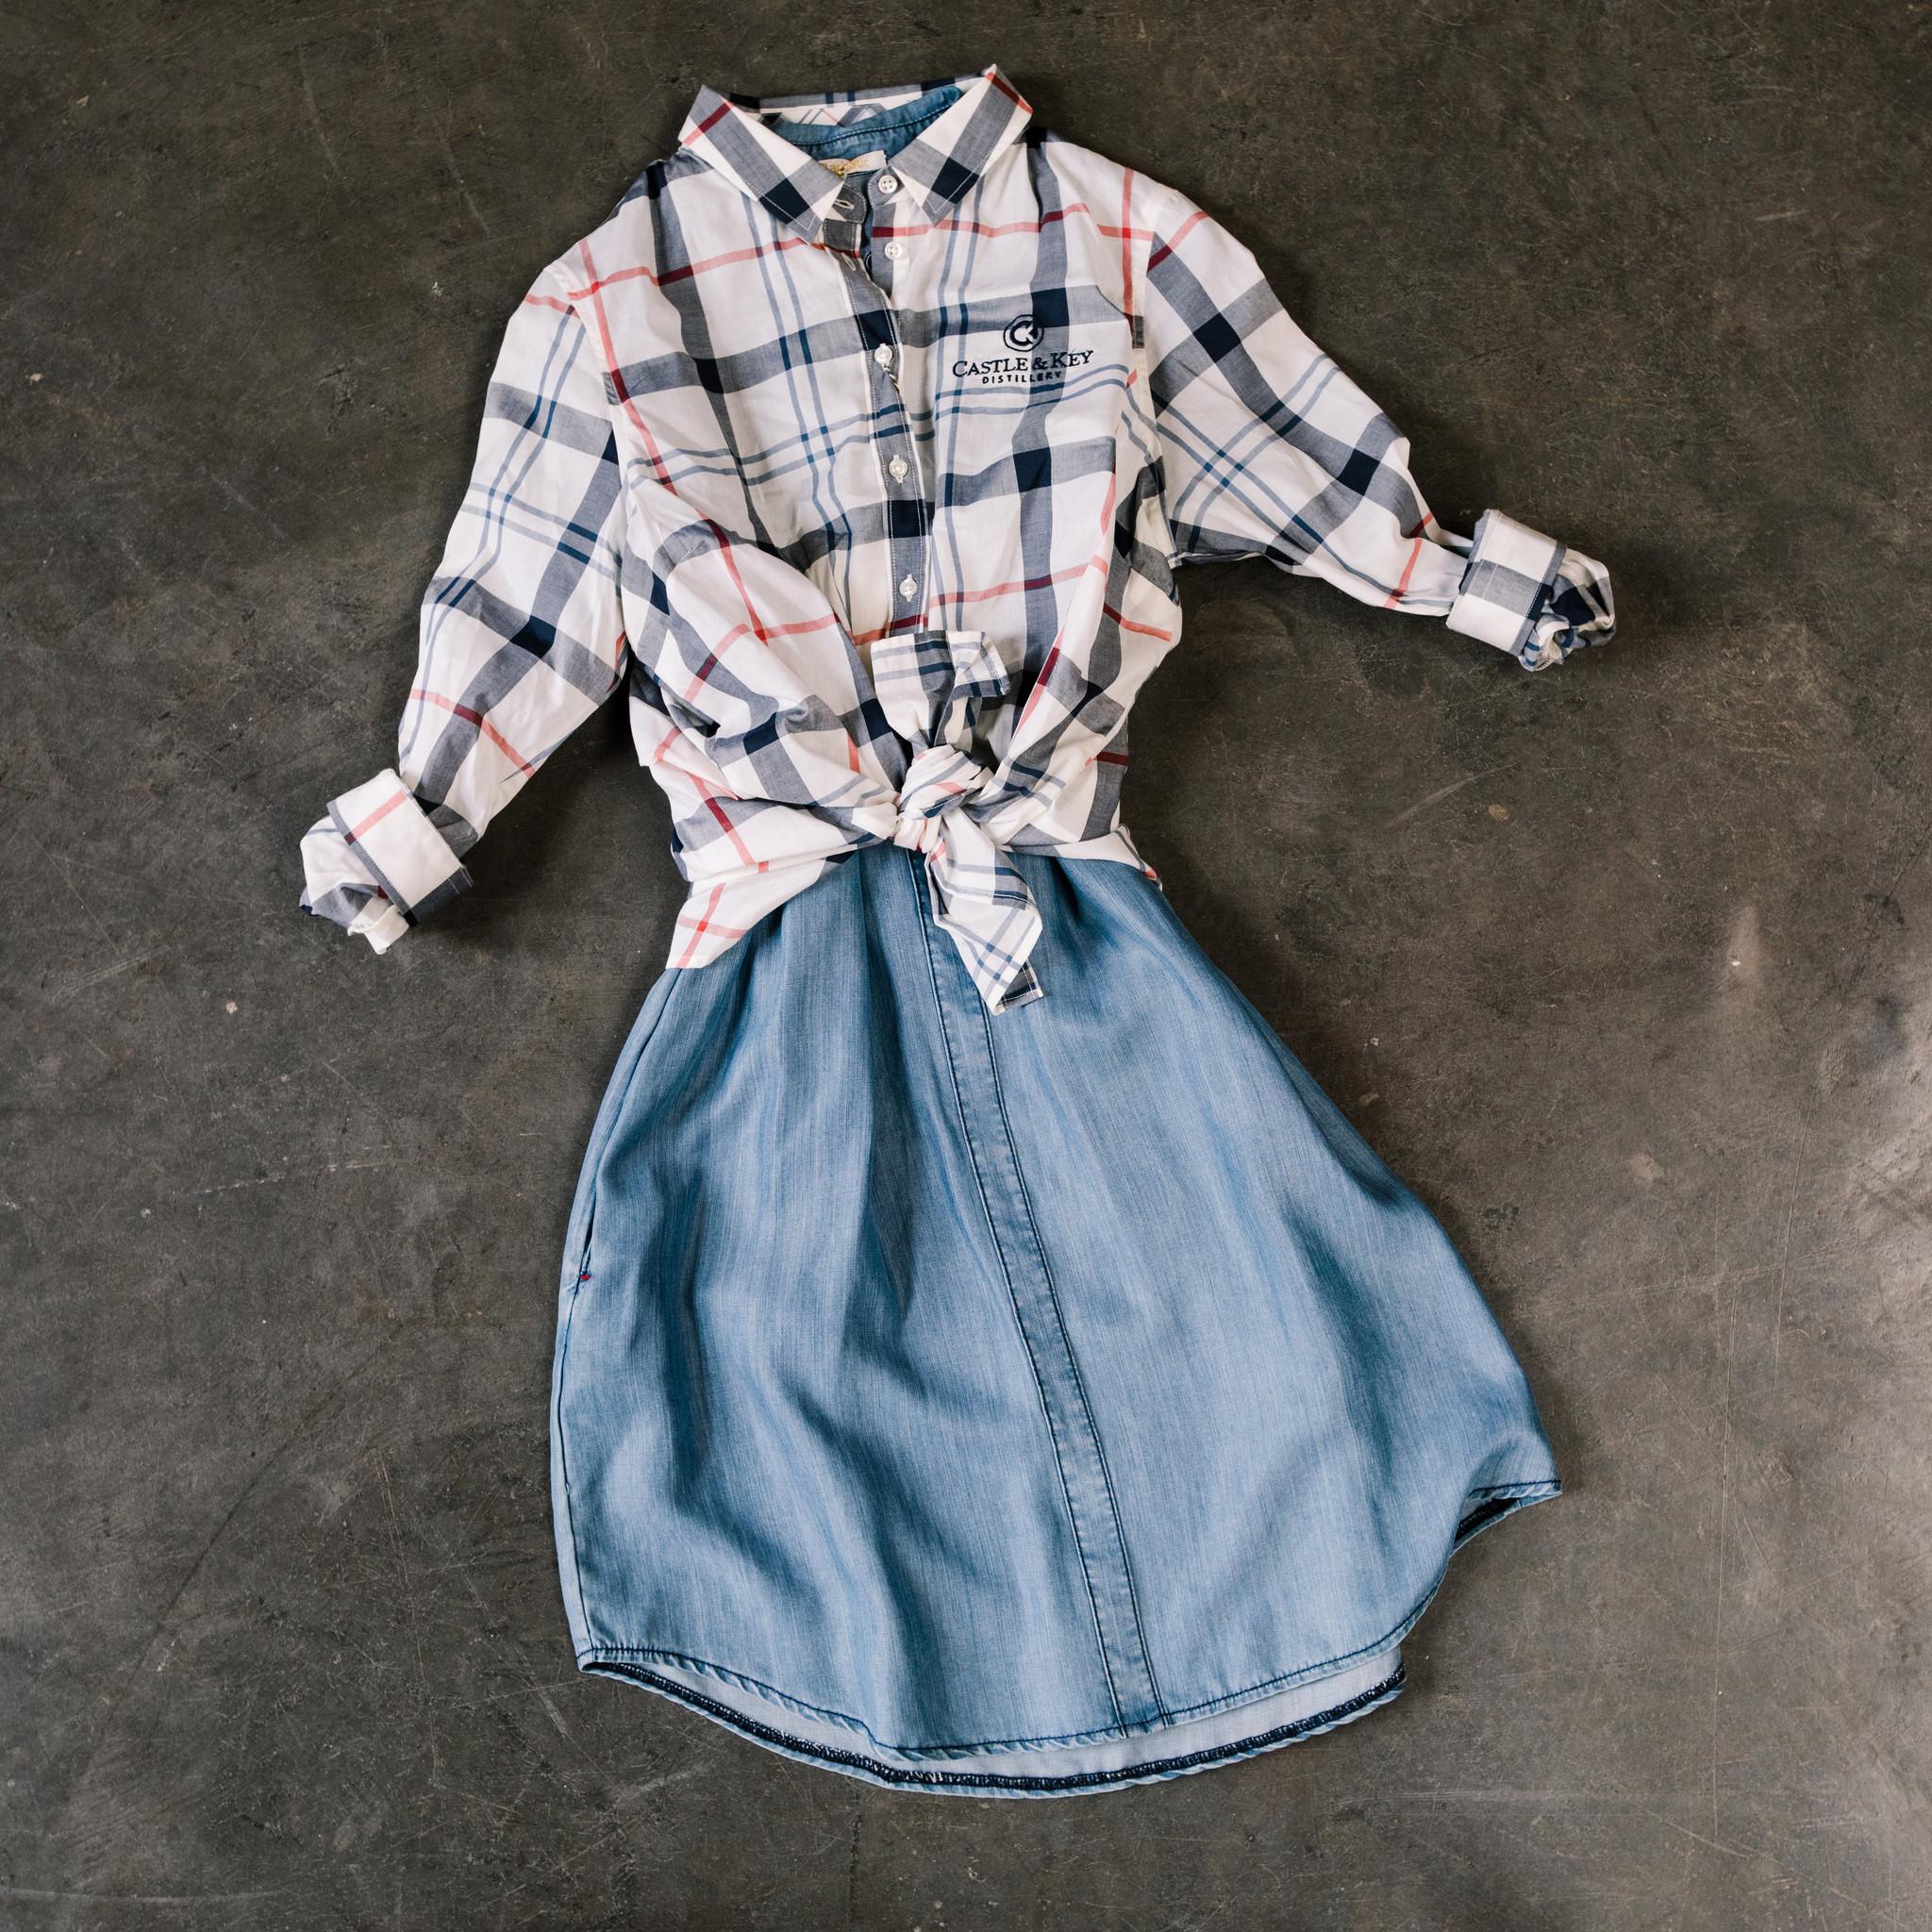 Barbour Barbour Fins Dress